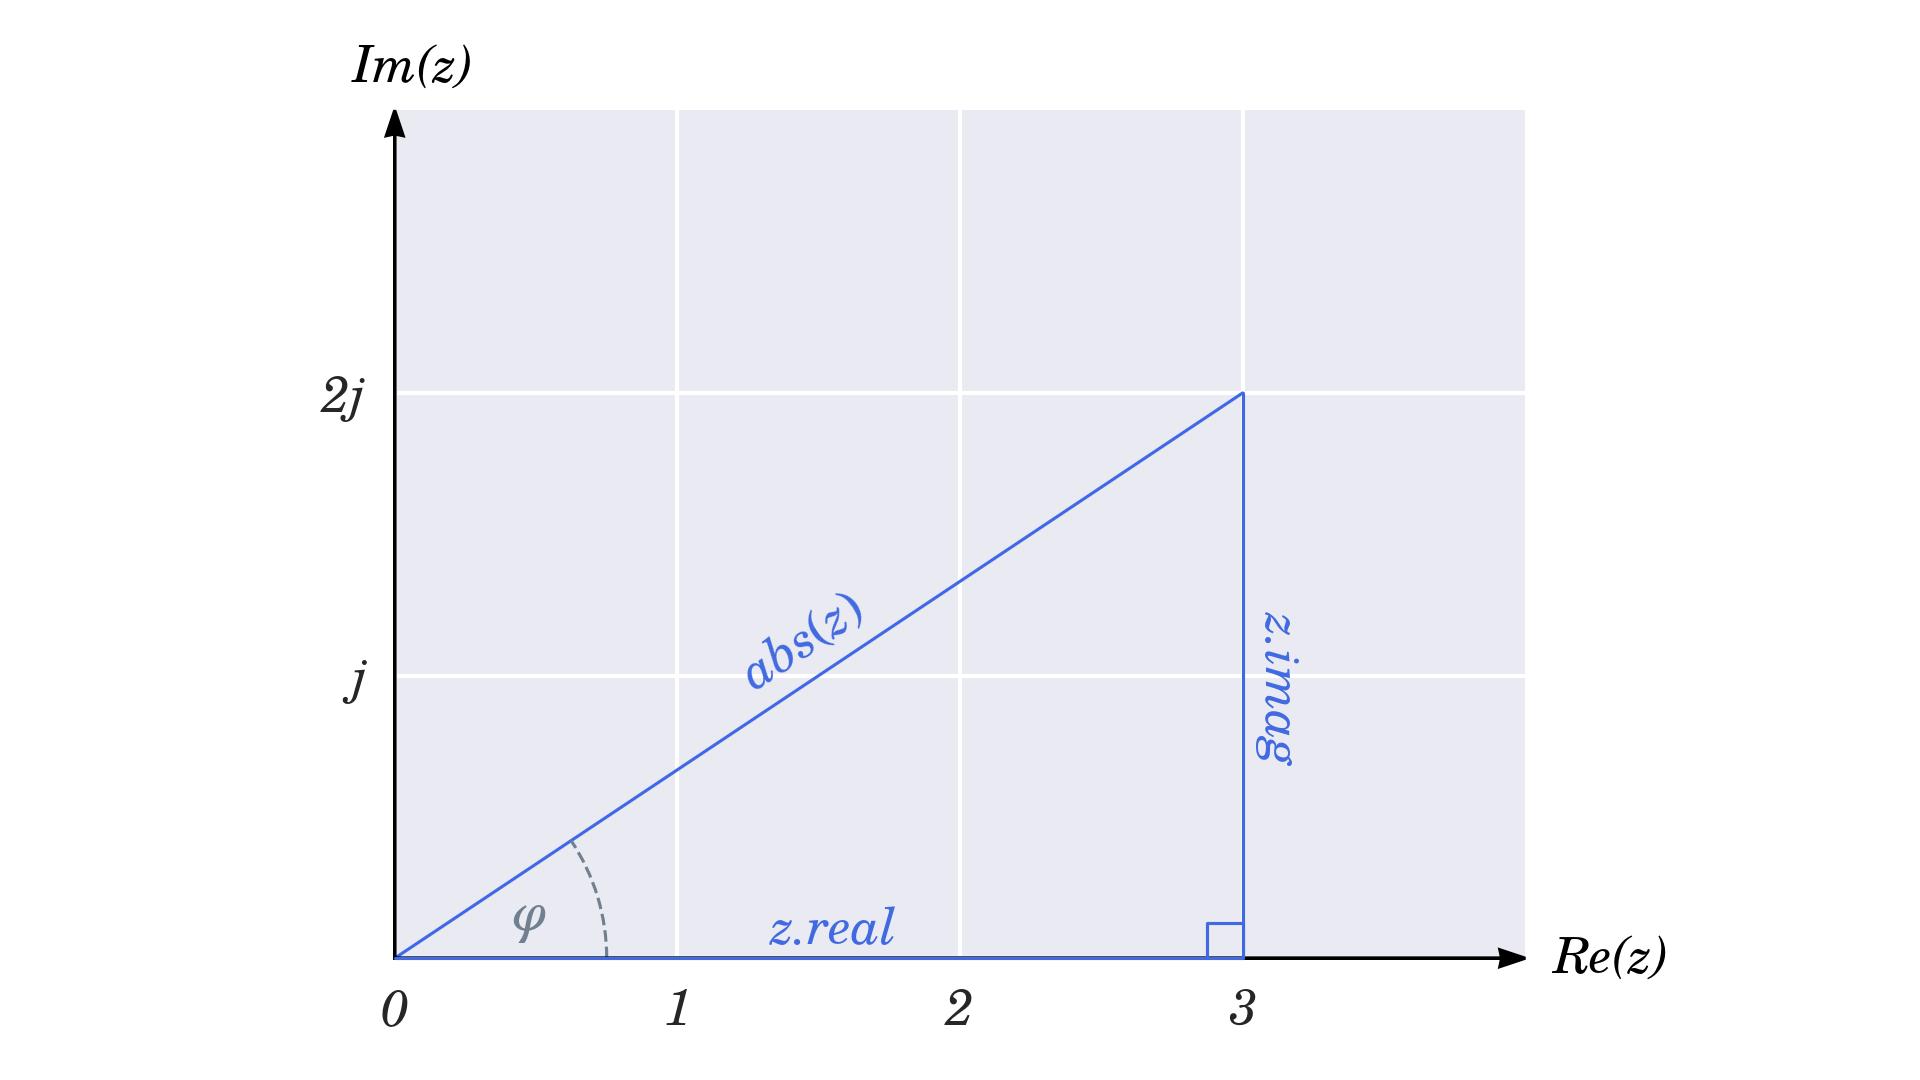 Using the Inverse Trigonometric Functions